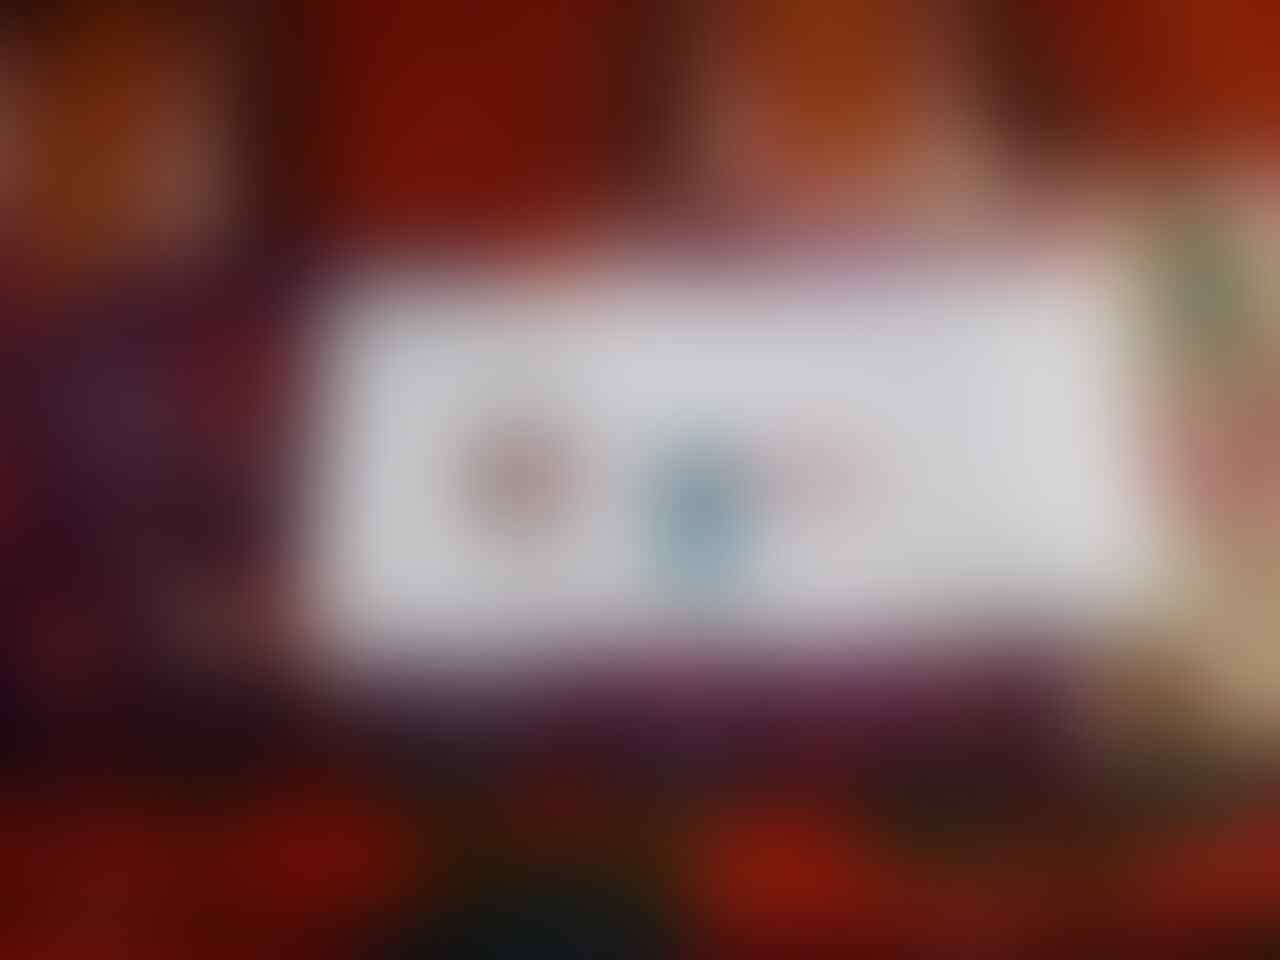 Para Kolektor Wajib Ikutan Nih di #MumpungRamadhan Challenge Vol. 10